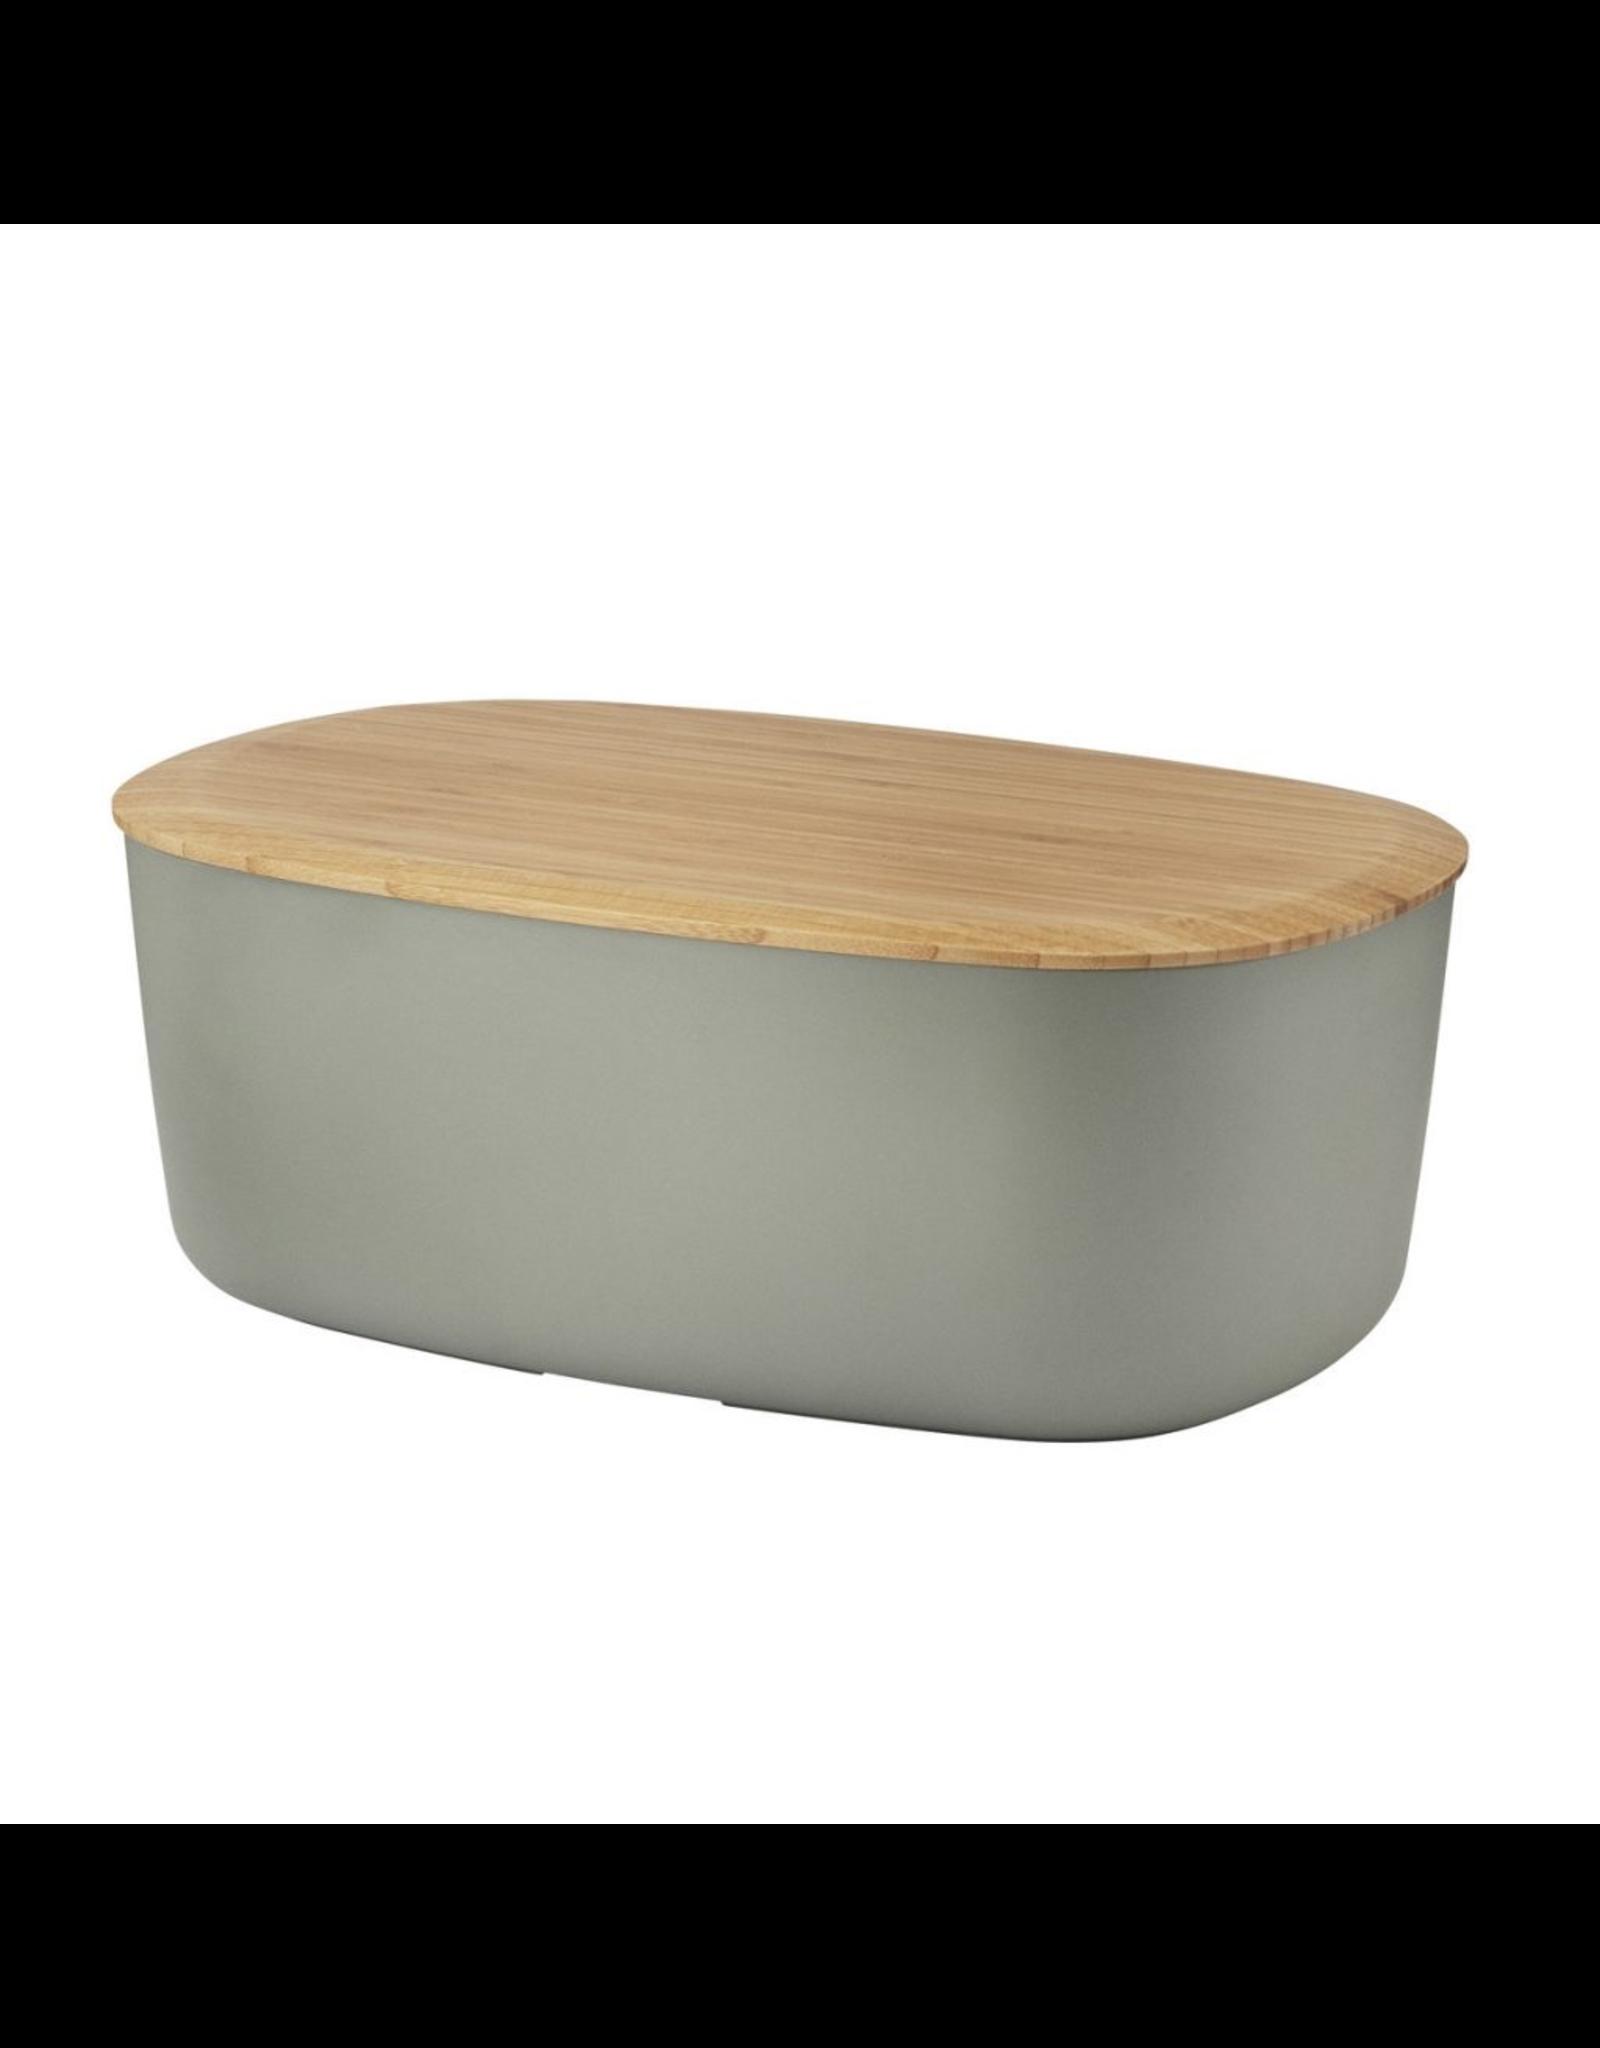 Stelton BOX-IT BREAD BOX - WARM GREY